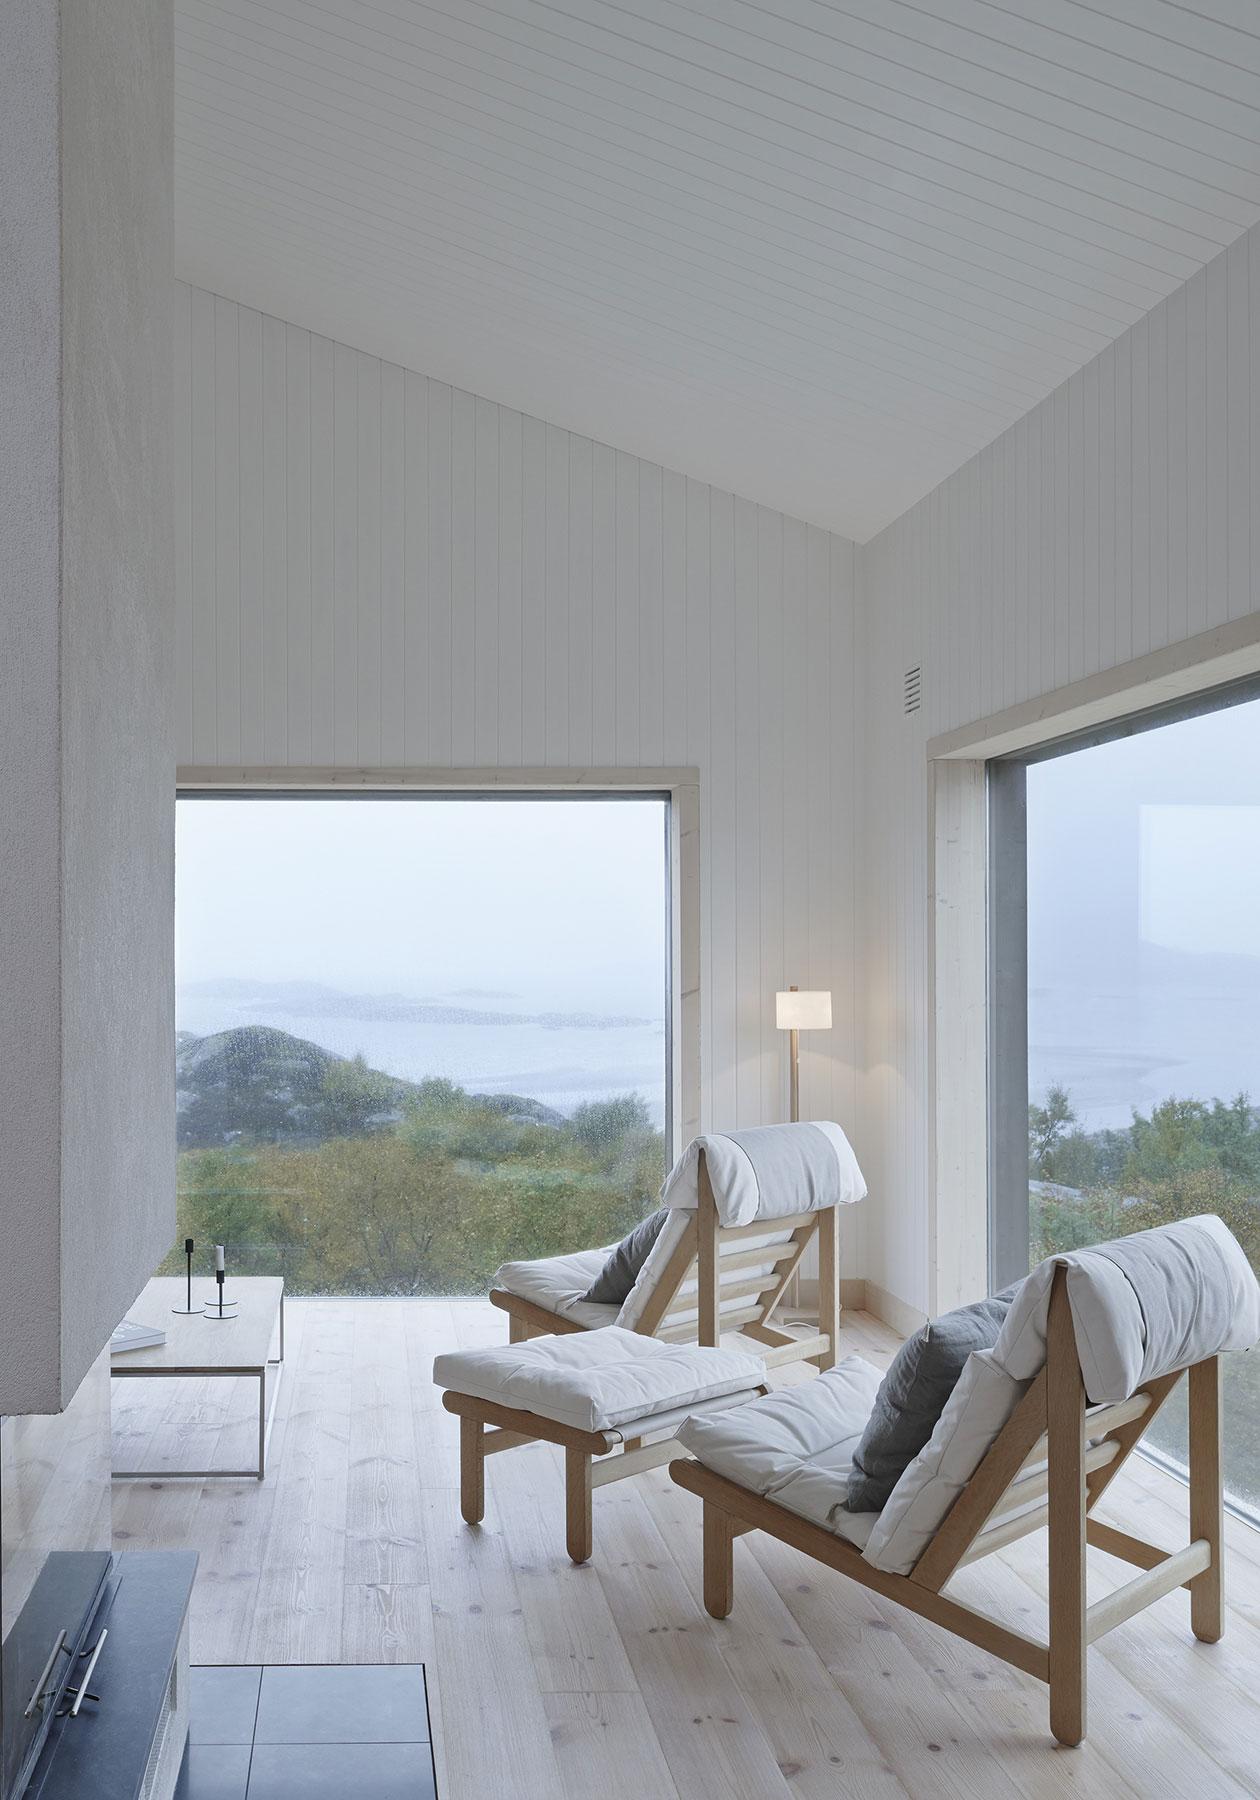 Chairs, Wood Floor, Large Windows, Vega Cottage in Vega, Norway